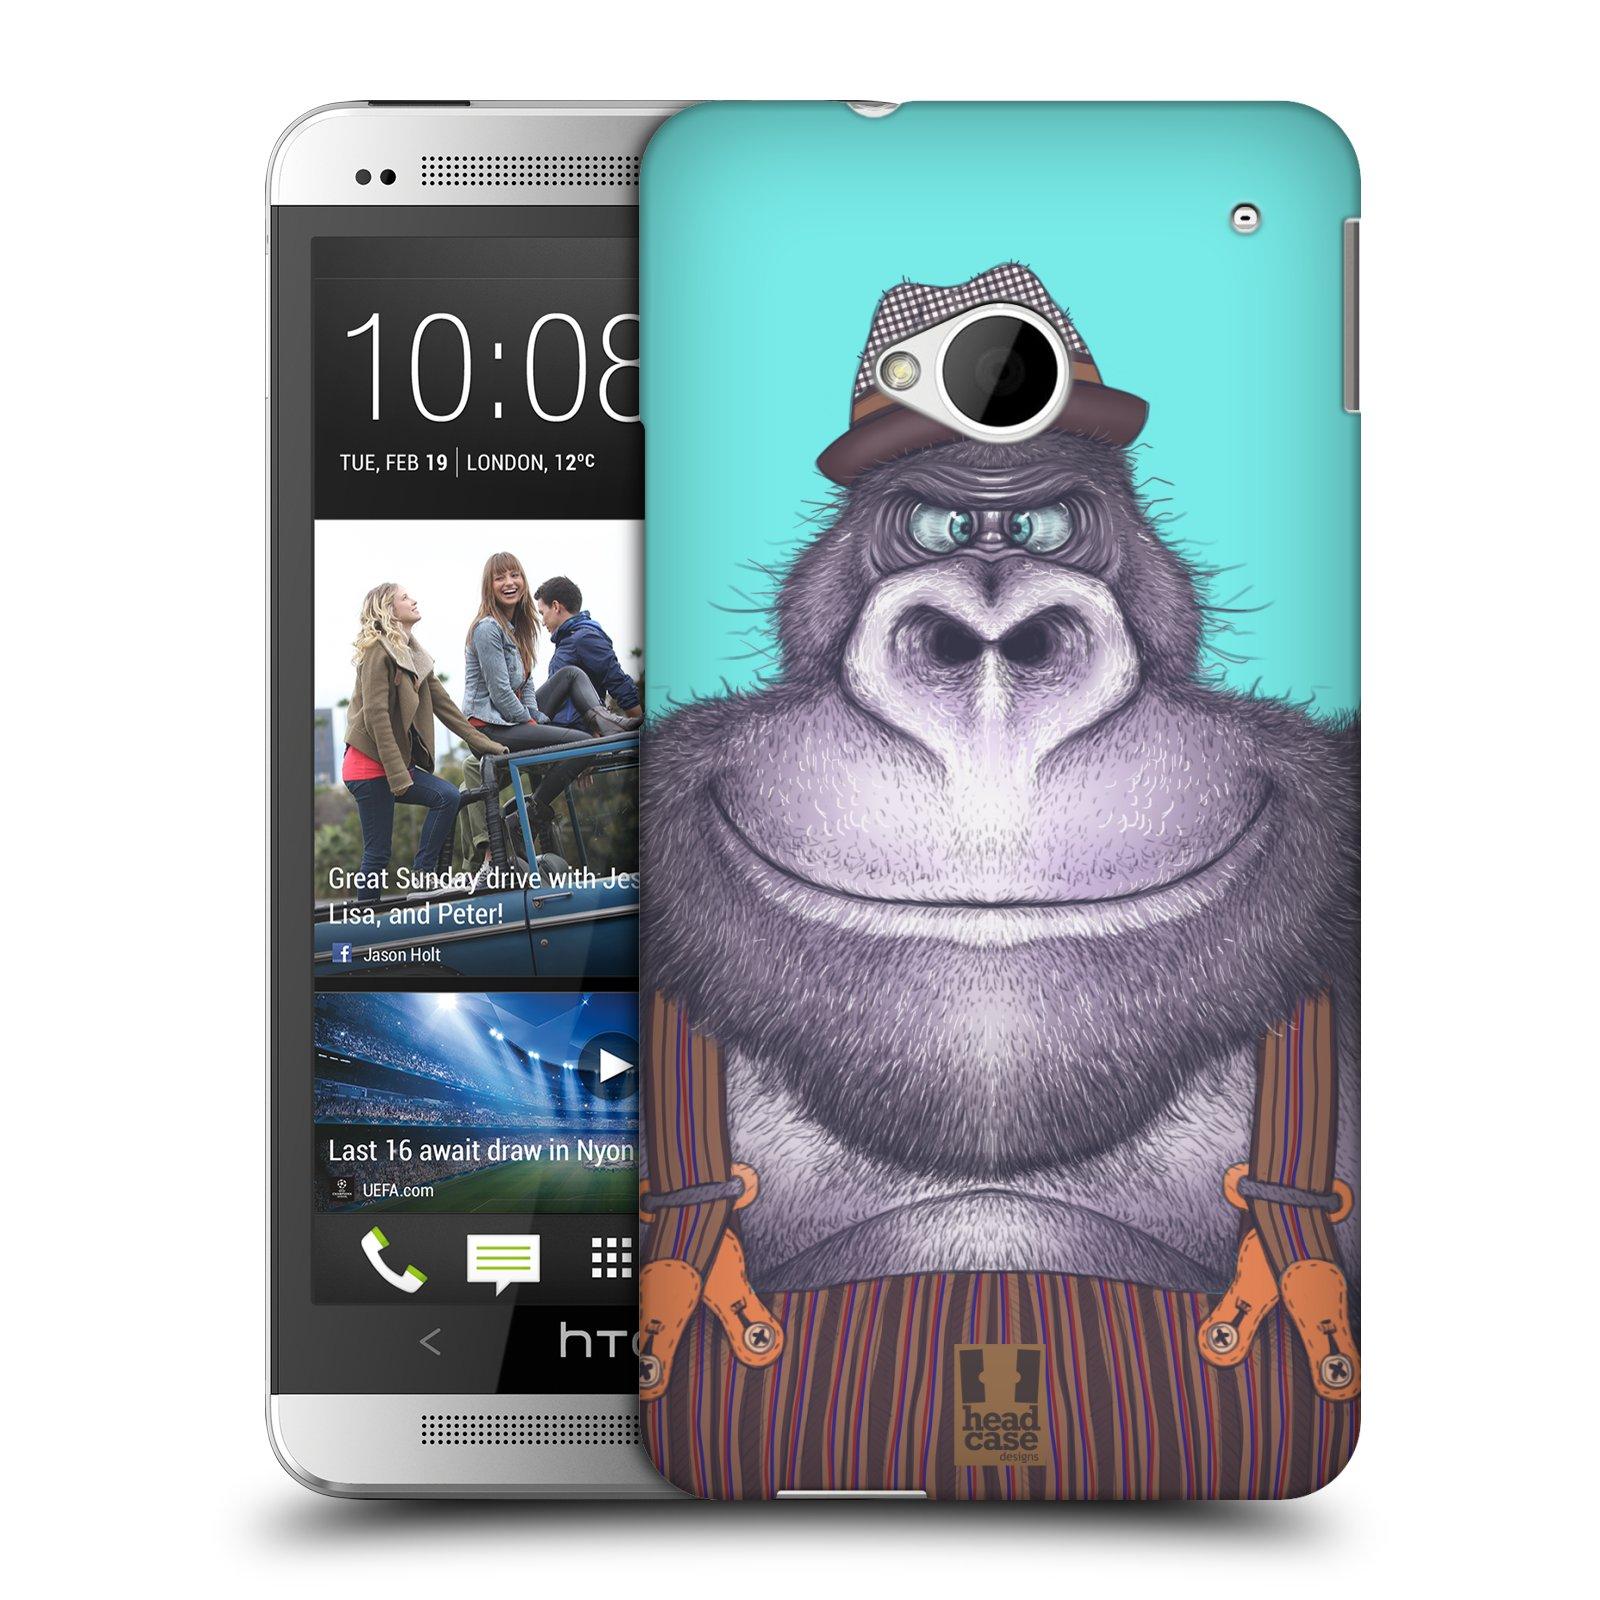 HEAD CASE plastový obal na mobil HTC One (M7) vzor Kreslená zvířátka gorila